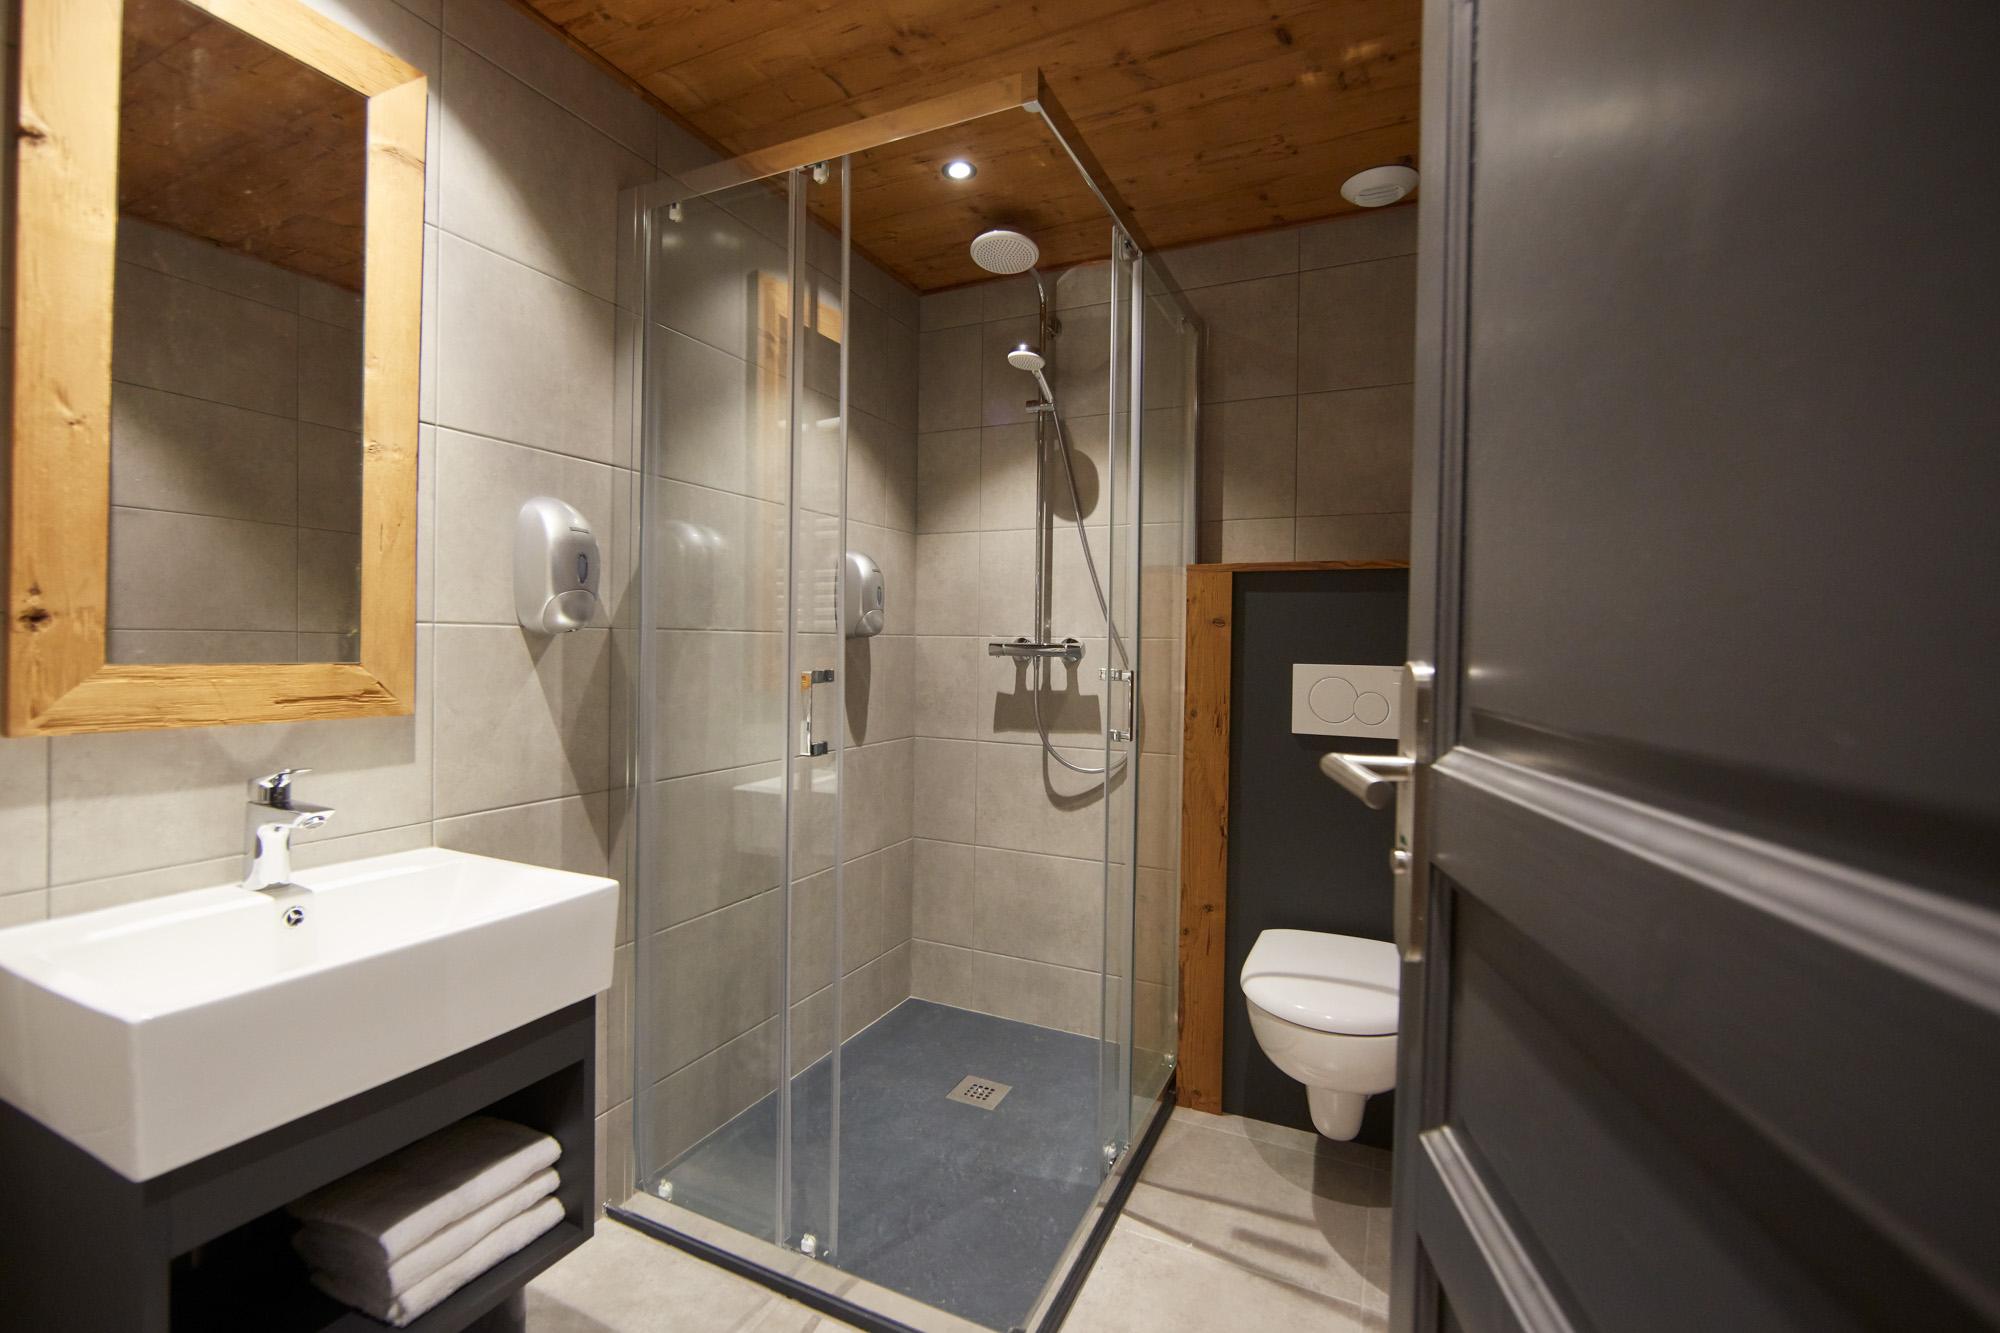 Moontain Salle de bain ch double.jpg